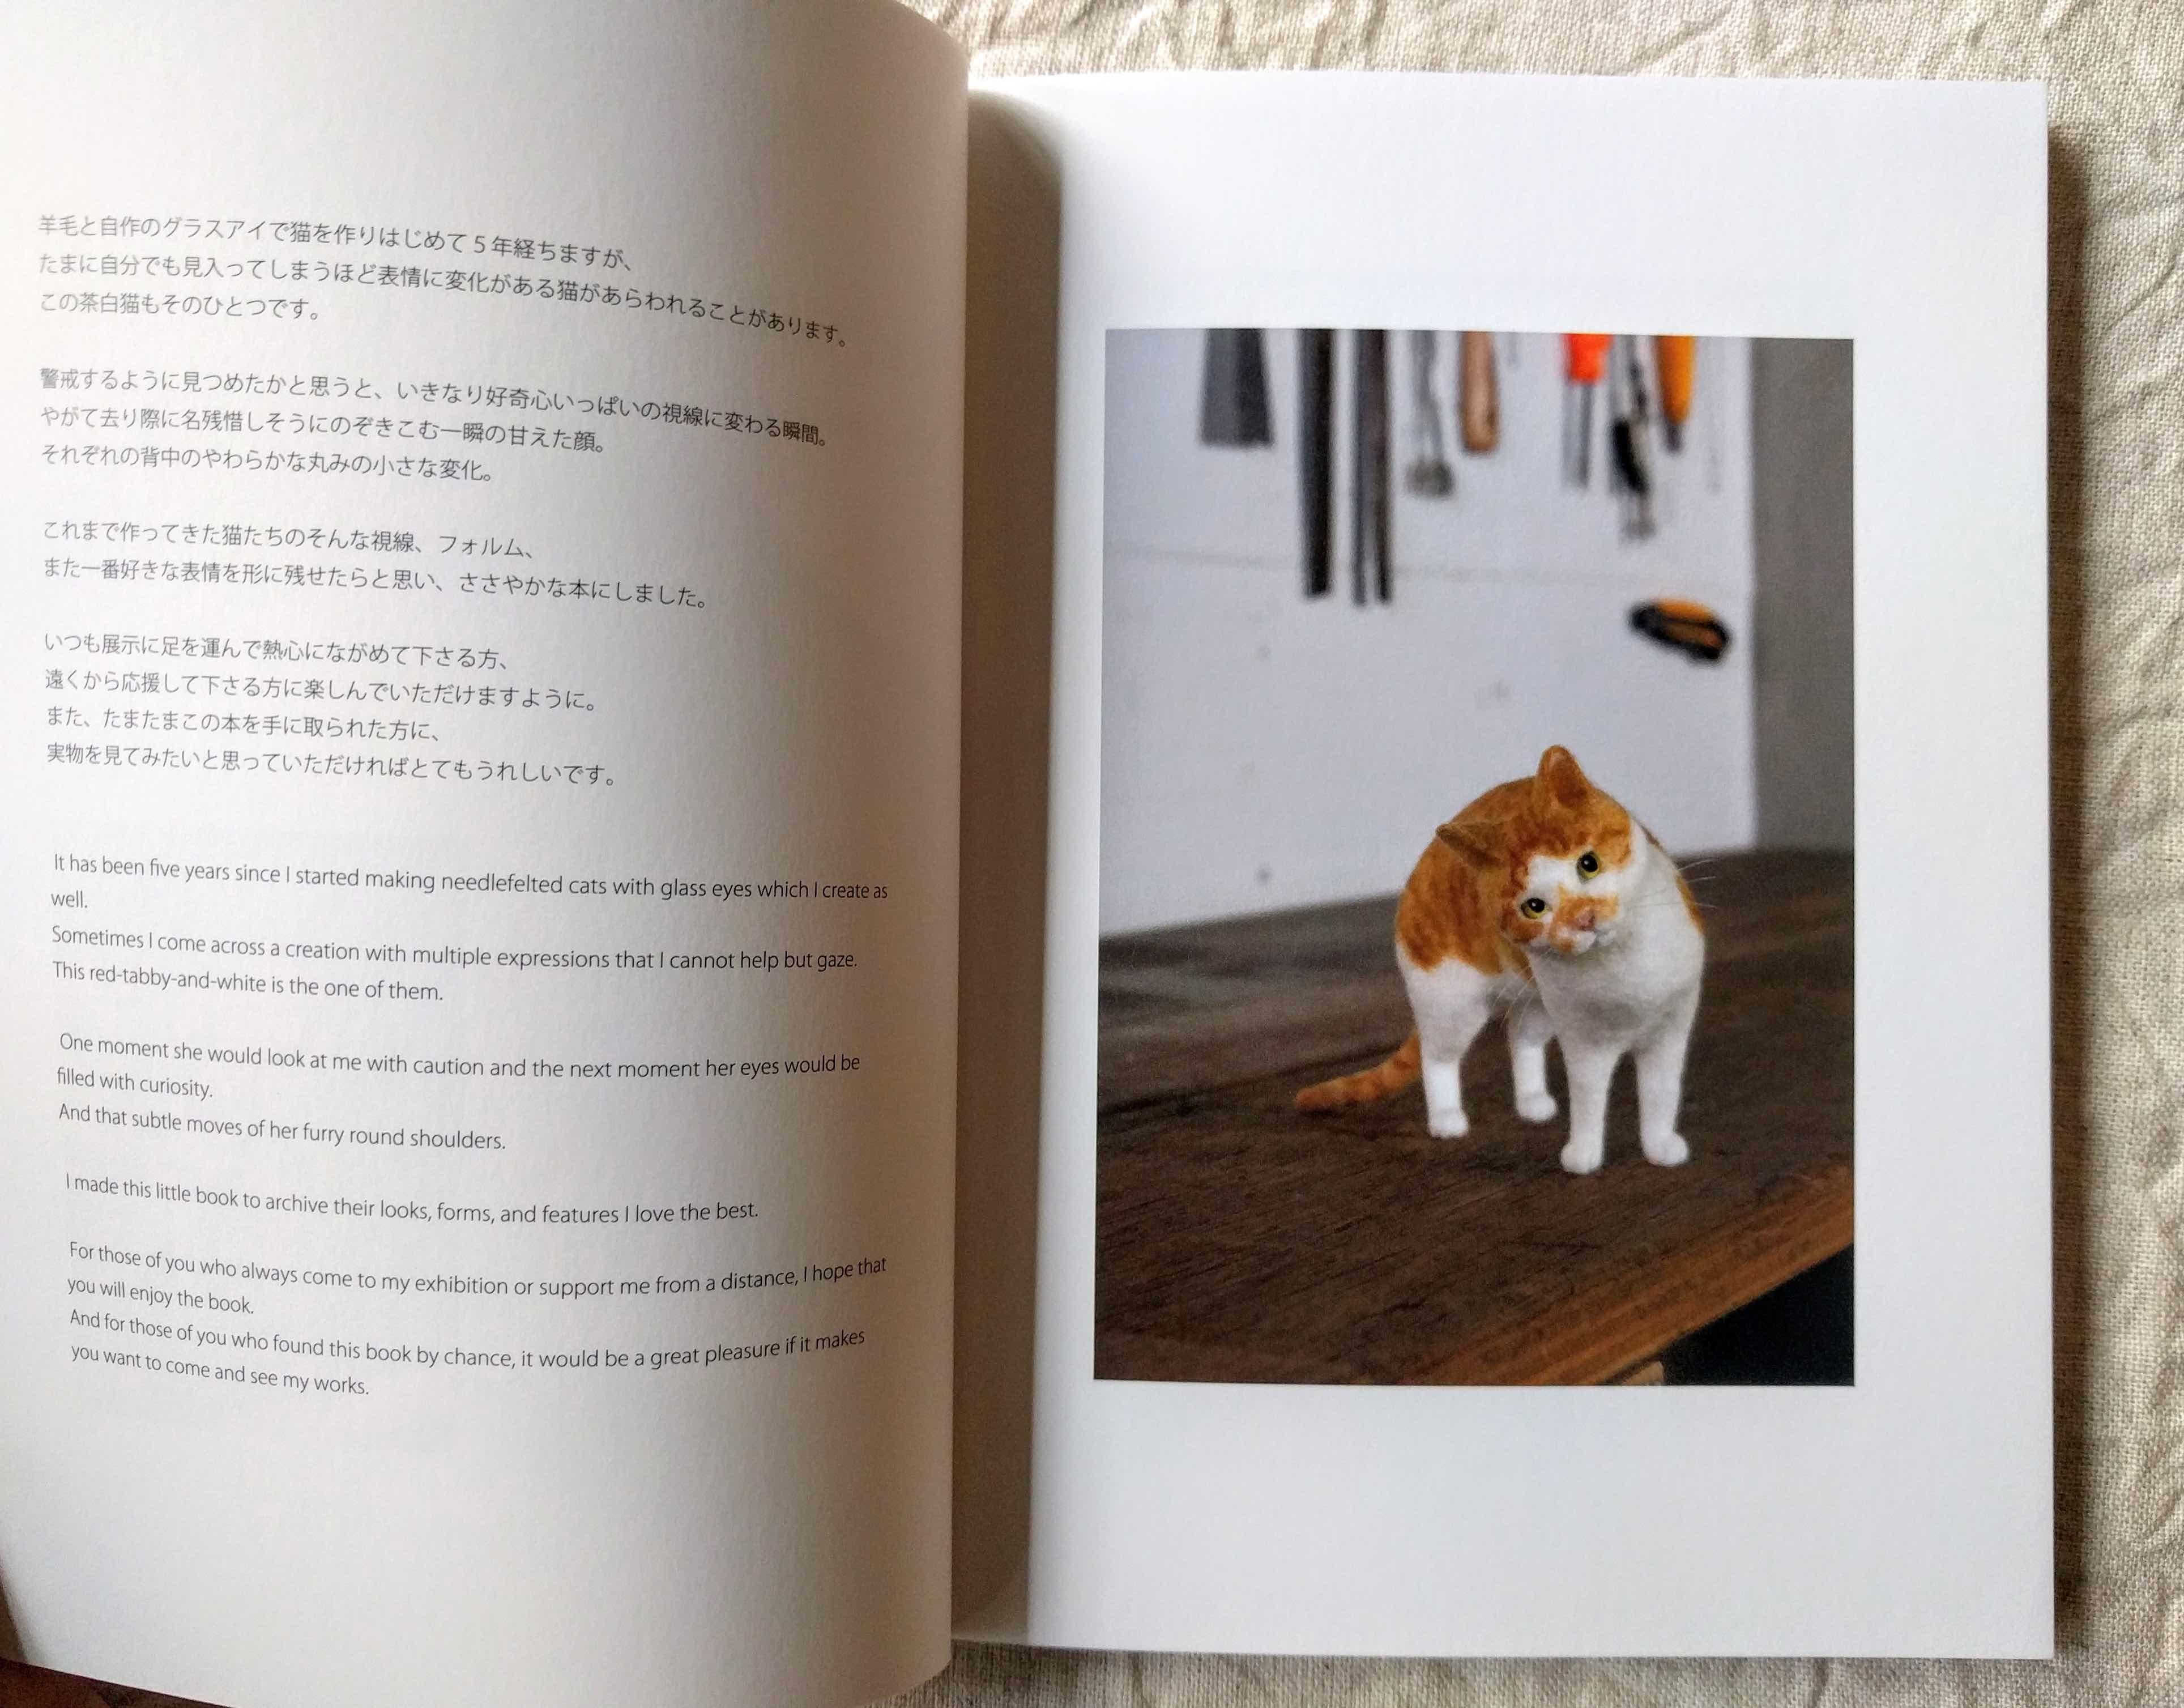 『FELT CATS』Nekolabo Works (猫ラボ)_a0265743_20464611.jpg